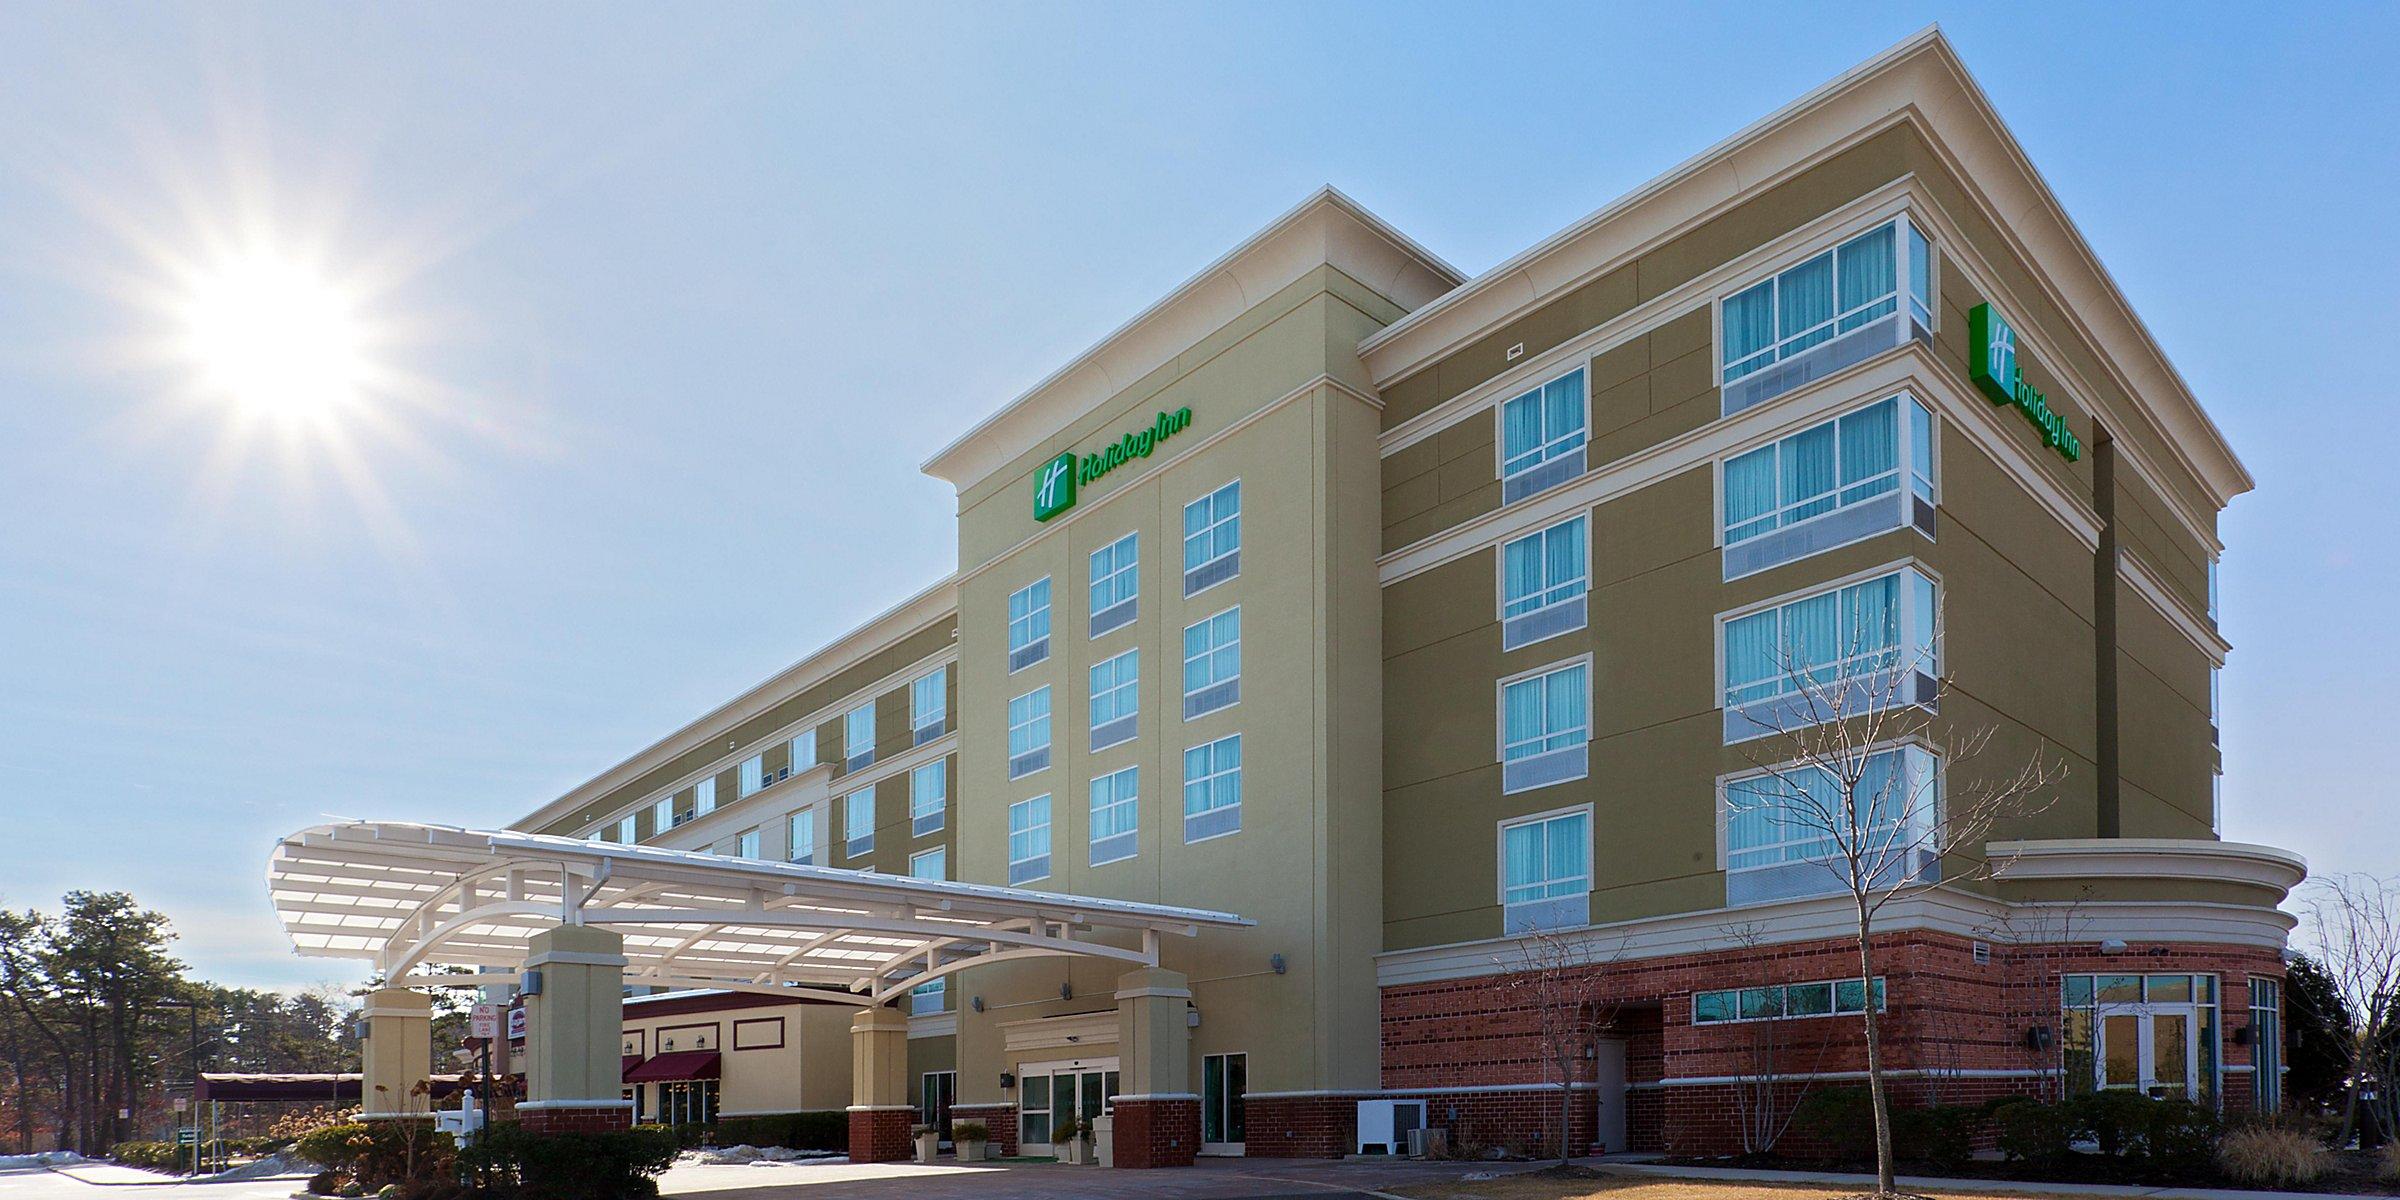 Hotels In Manahawkin Nj Near Lbi Holiday Inn Manahawkin Long Beach Island